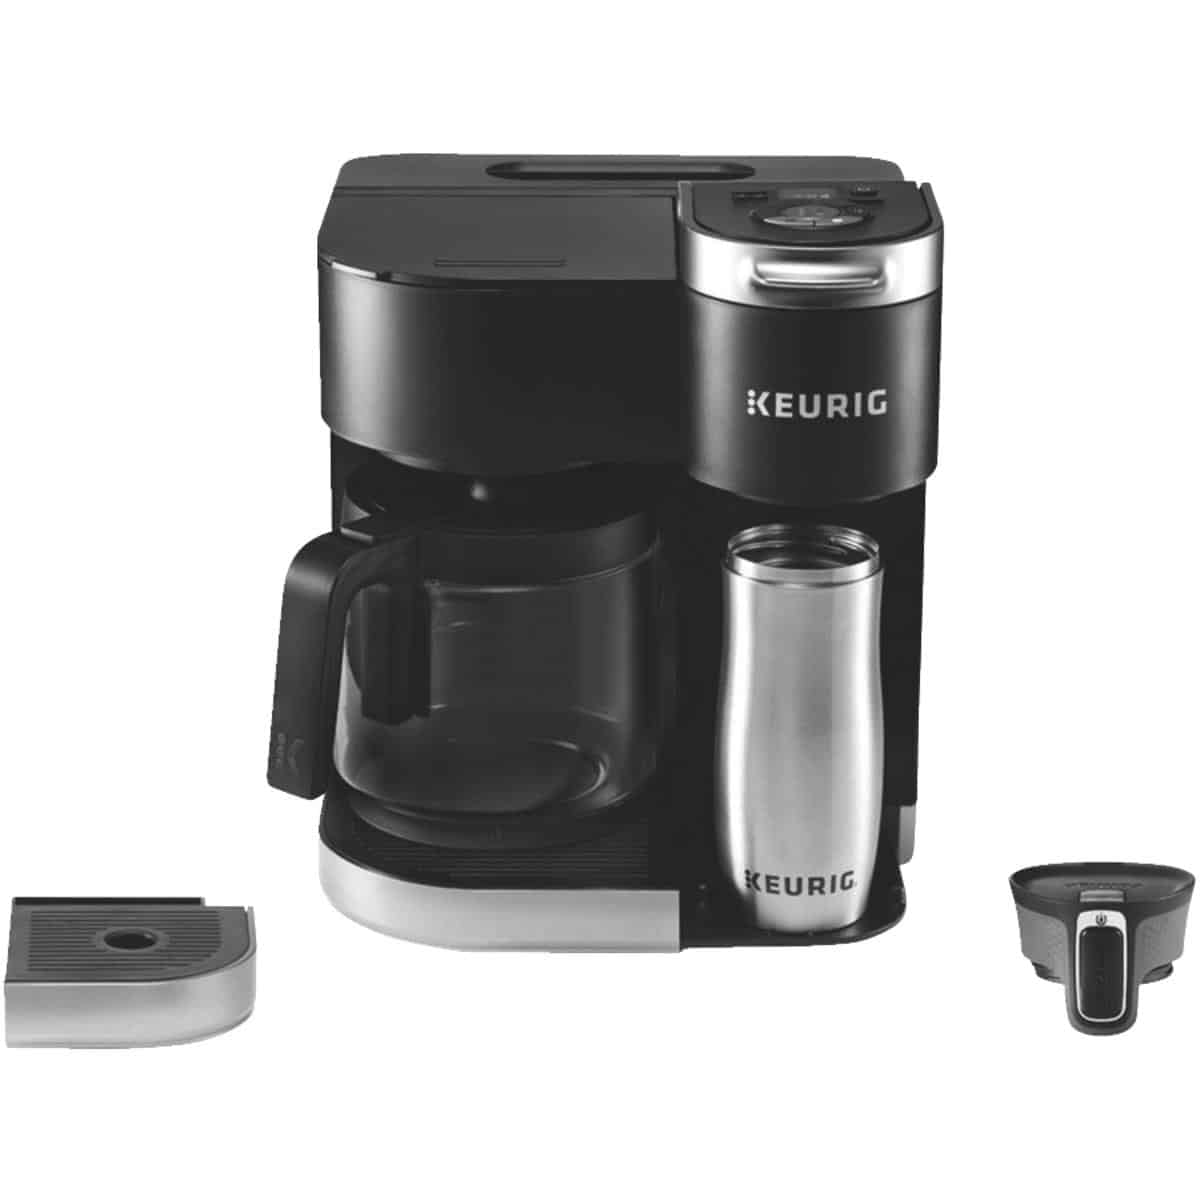 Keurig K-Duo Travel Mug Friendly